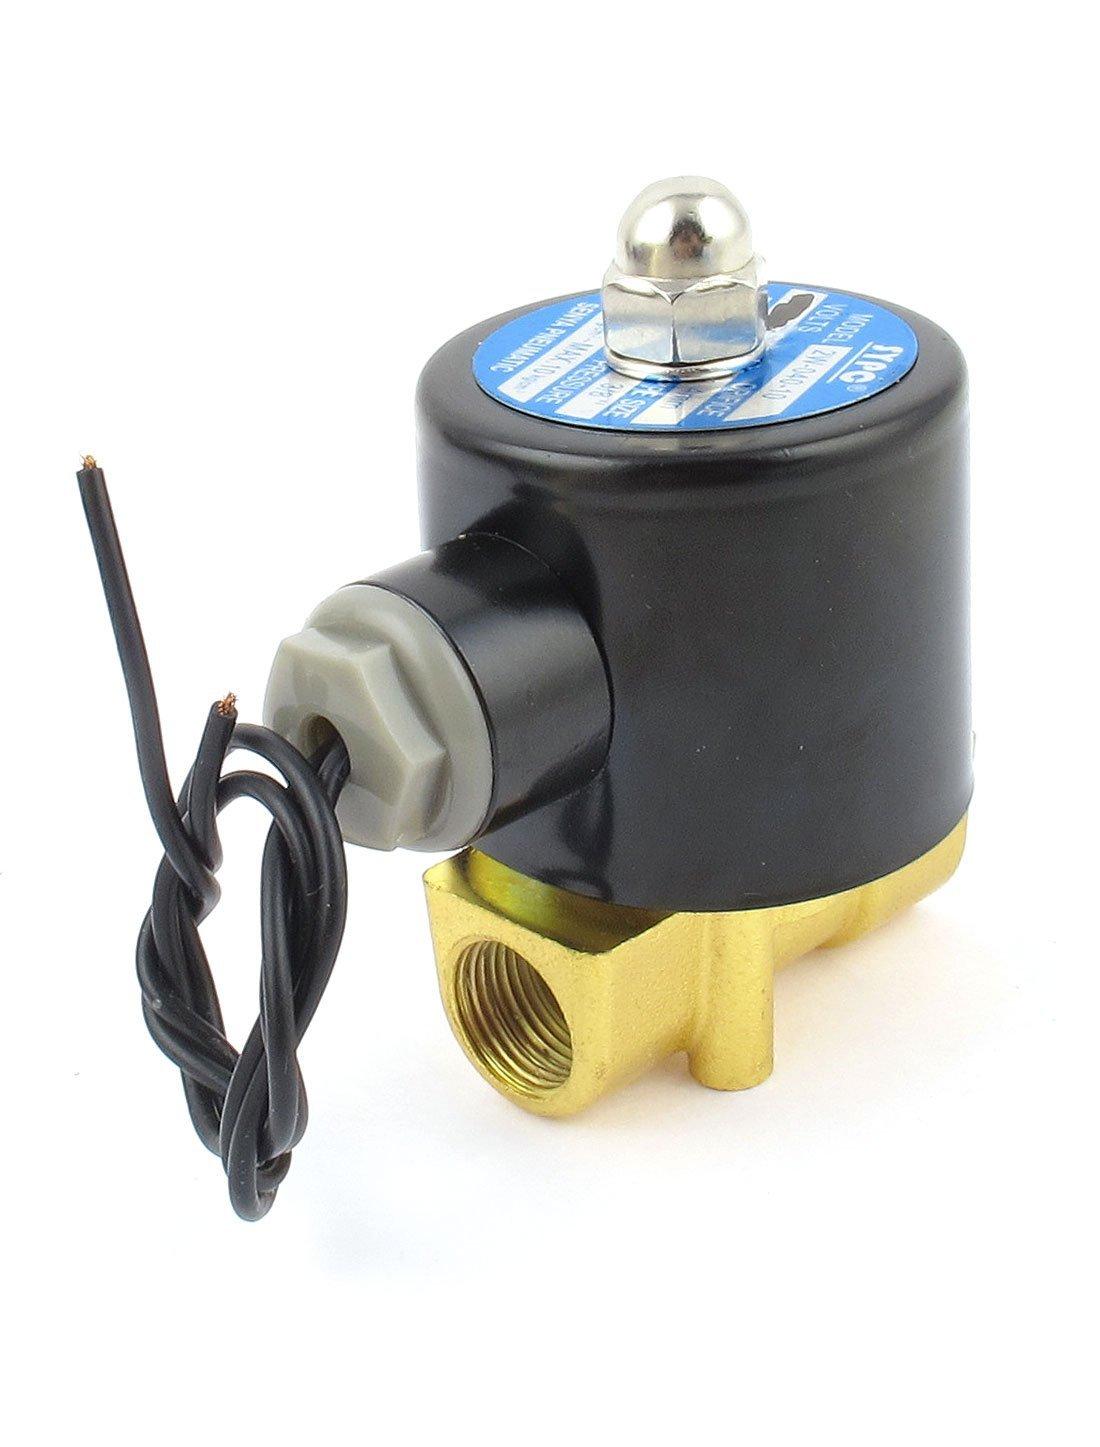 EbuyChX AC 220V 2W 3 / 8BSP Normal Isara Water Gas Oil Electric Solenoid, balbula